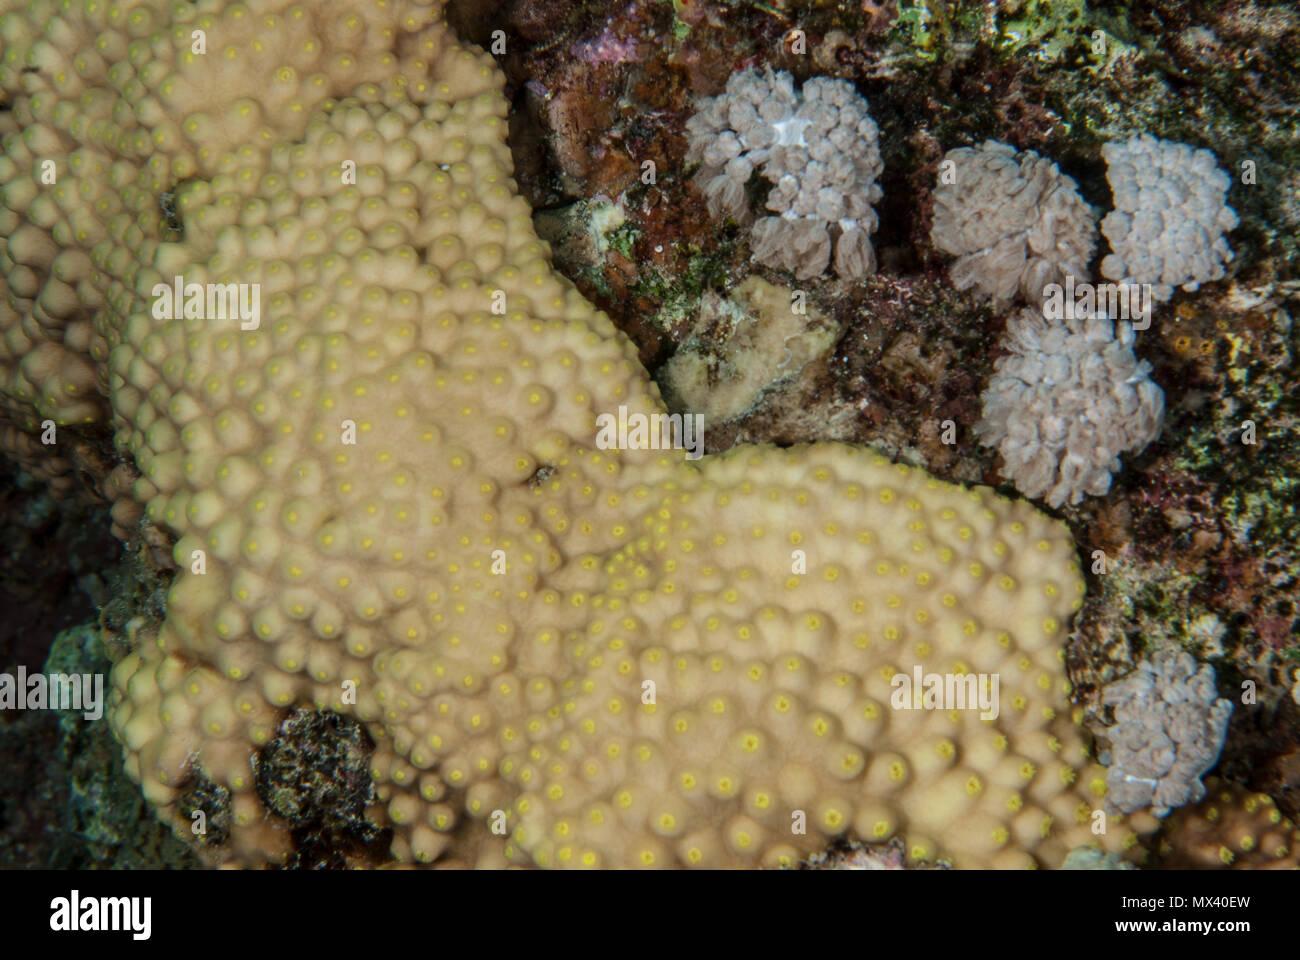 Chalice coral, Oxypora egyptensis, Pectiniidae, Sharm El Sheikh, Red Sea, Egypt - Stock Image